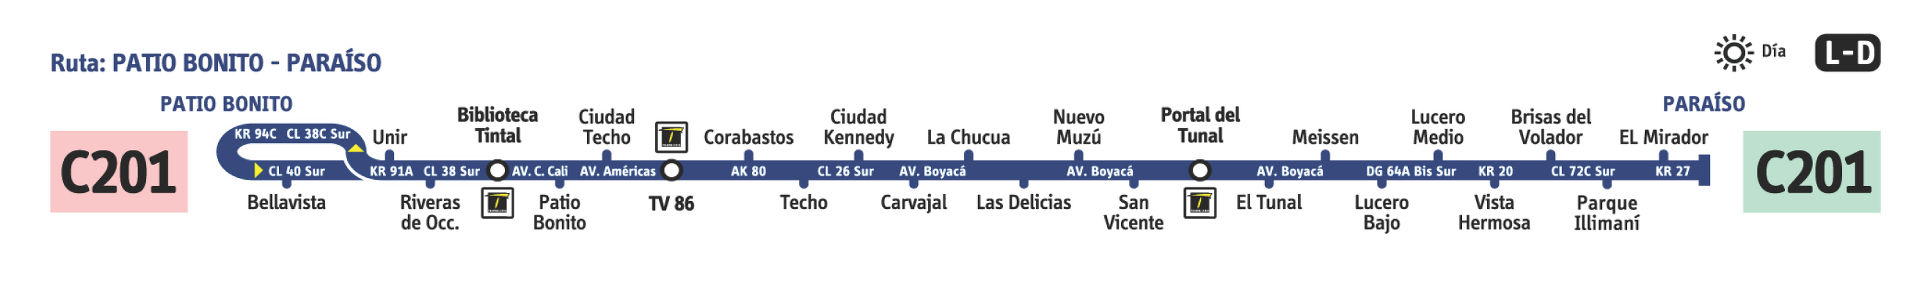 Ruta SITP: C201 Paraíso ↔ Patio Bonito [Urbana] 1